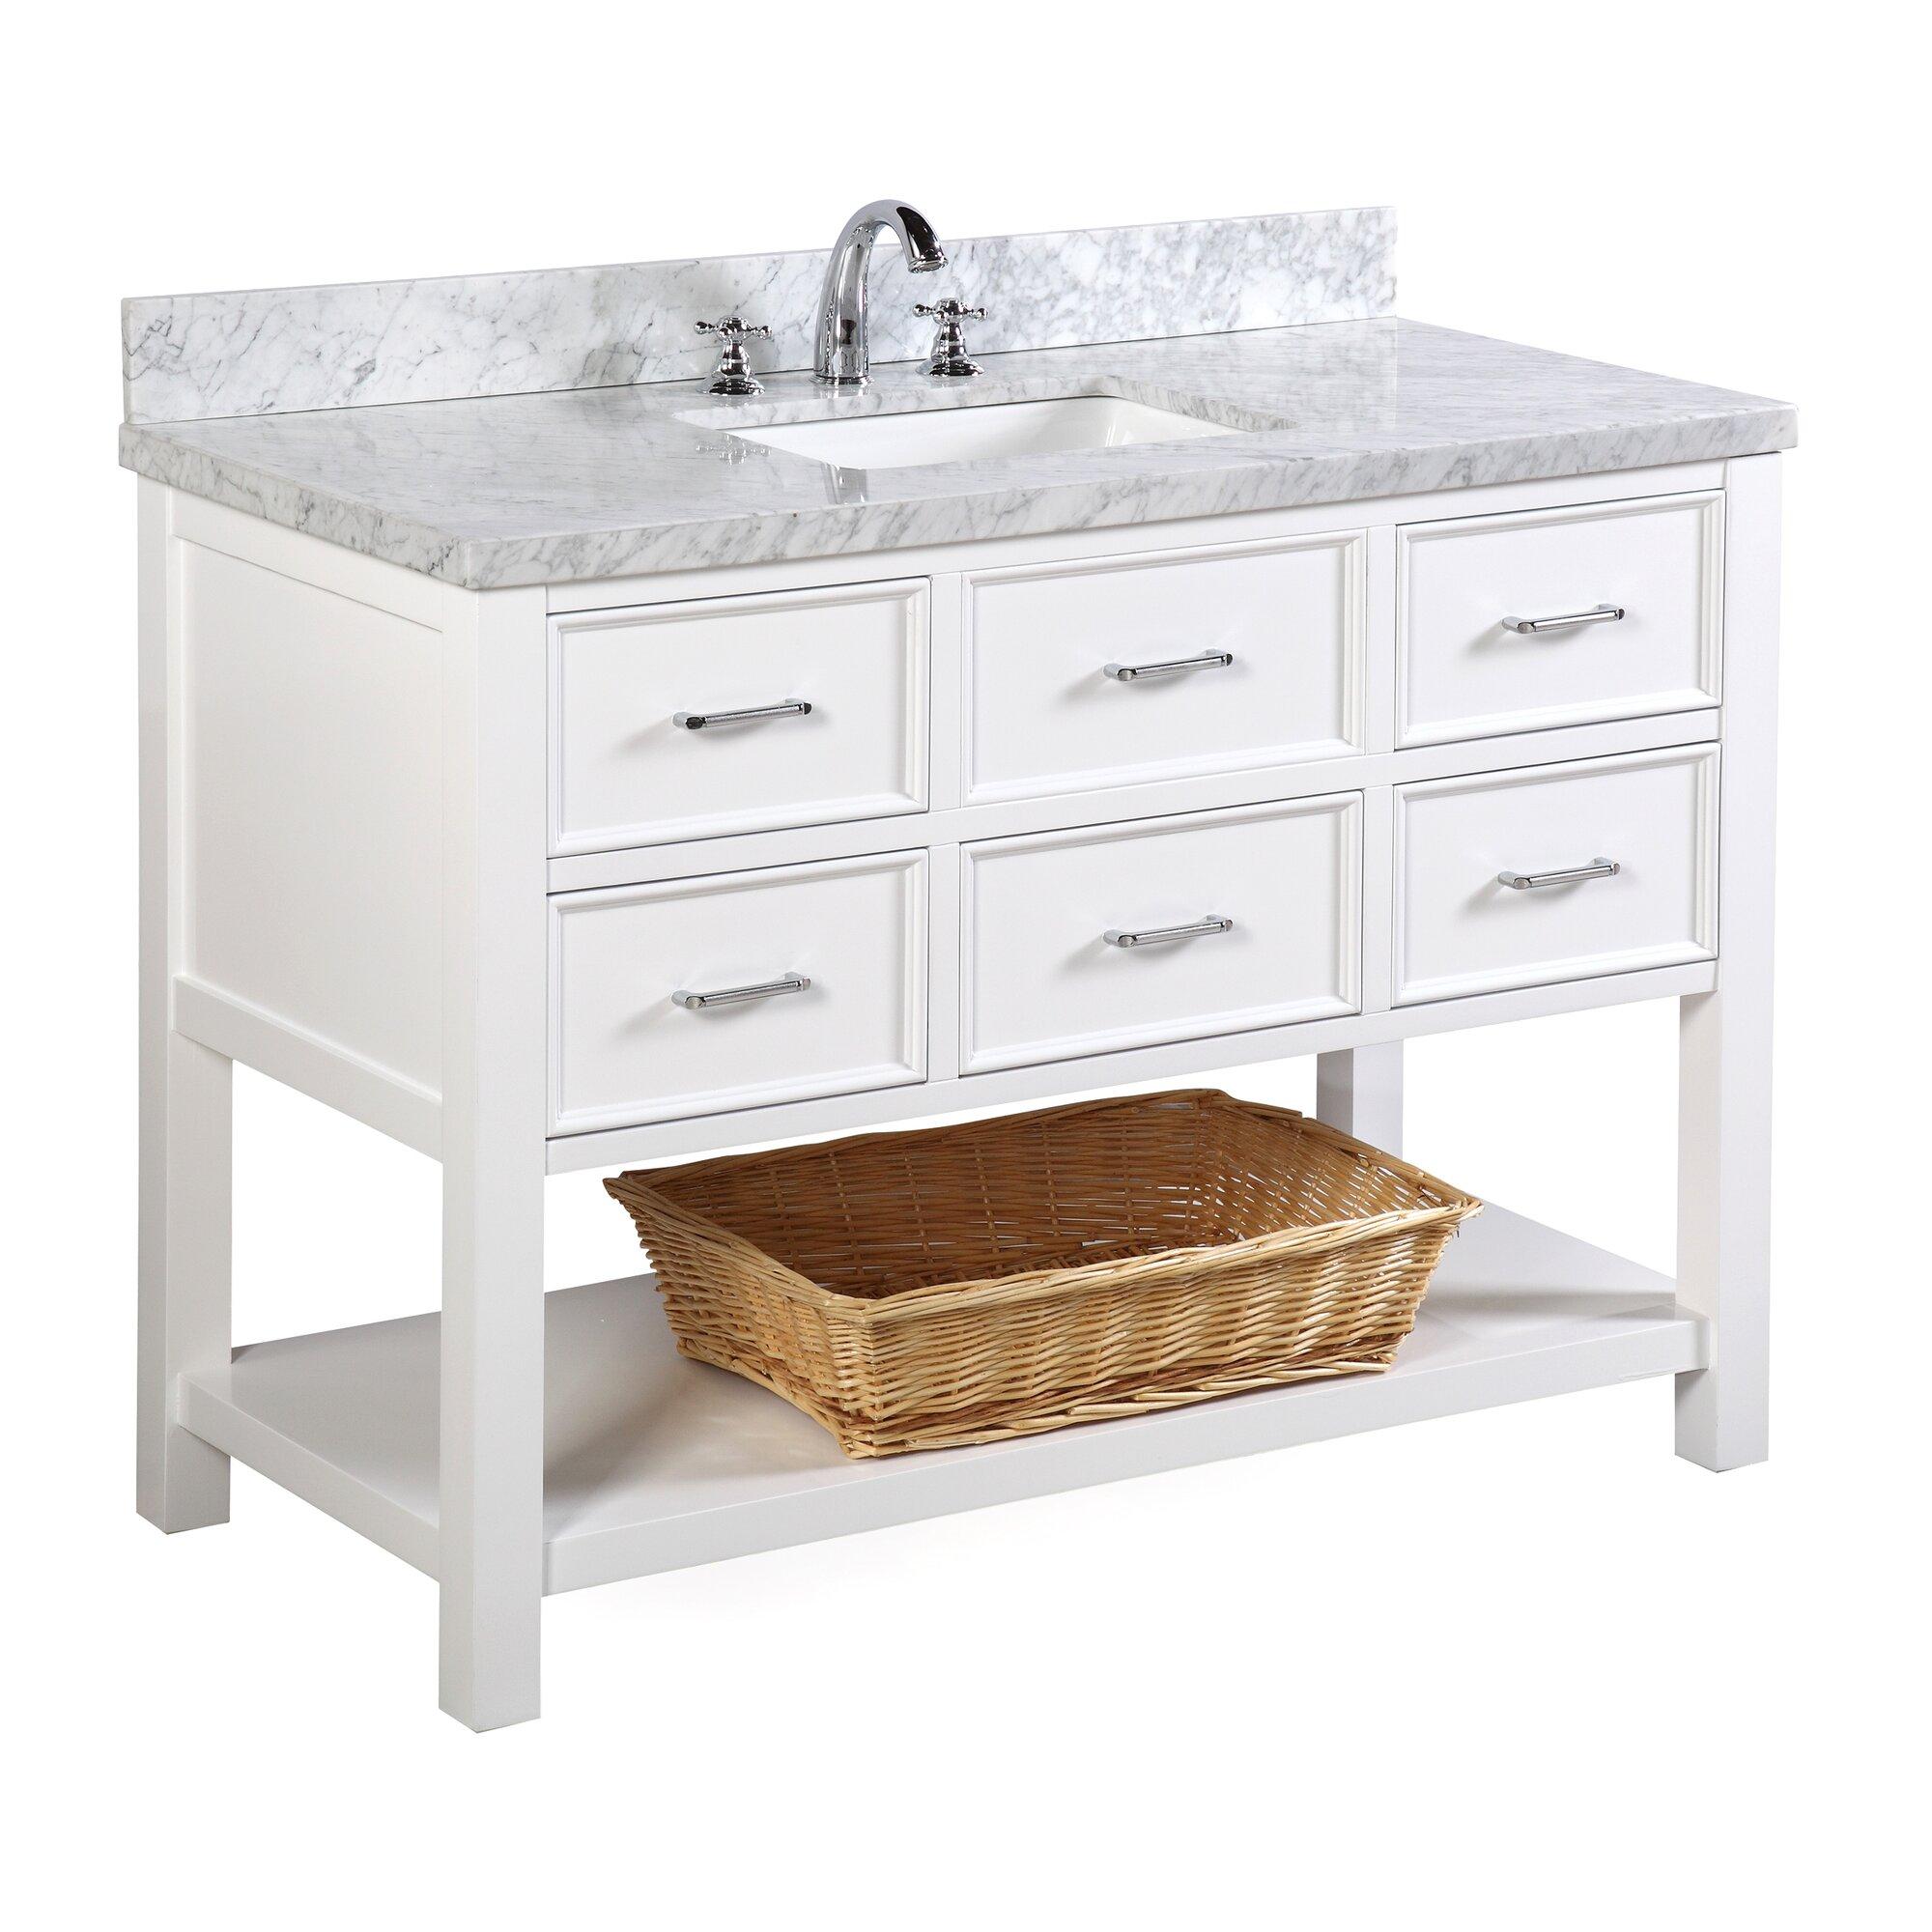 kbc new hampshire 48 single bathroom vanity set reviews wayfair